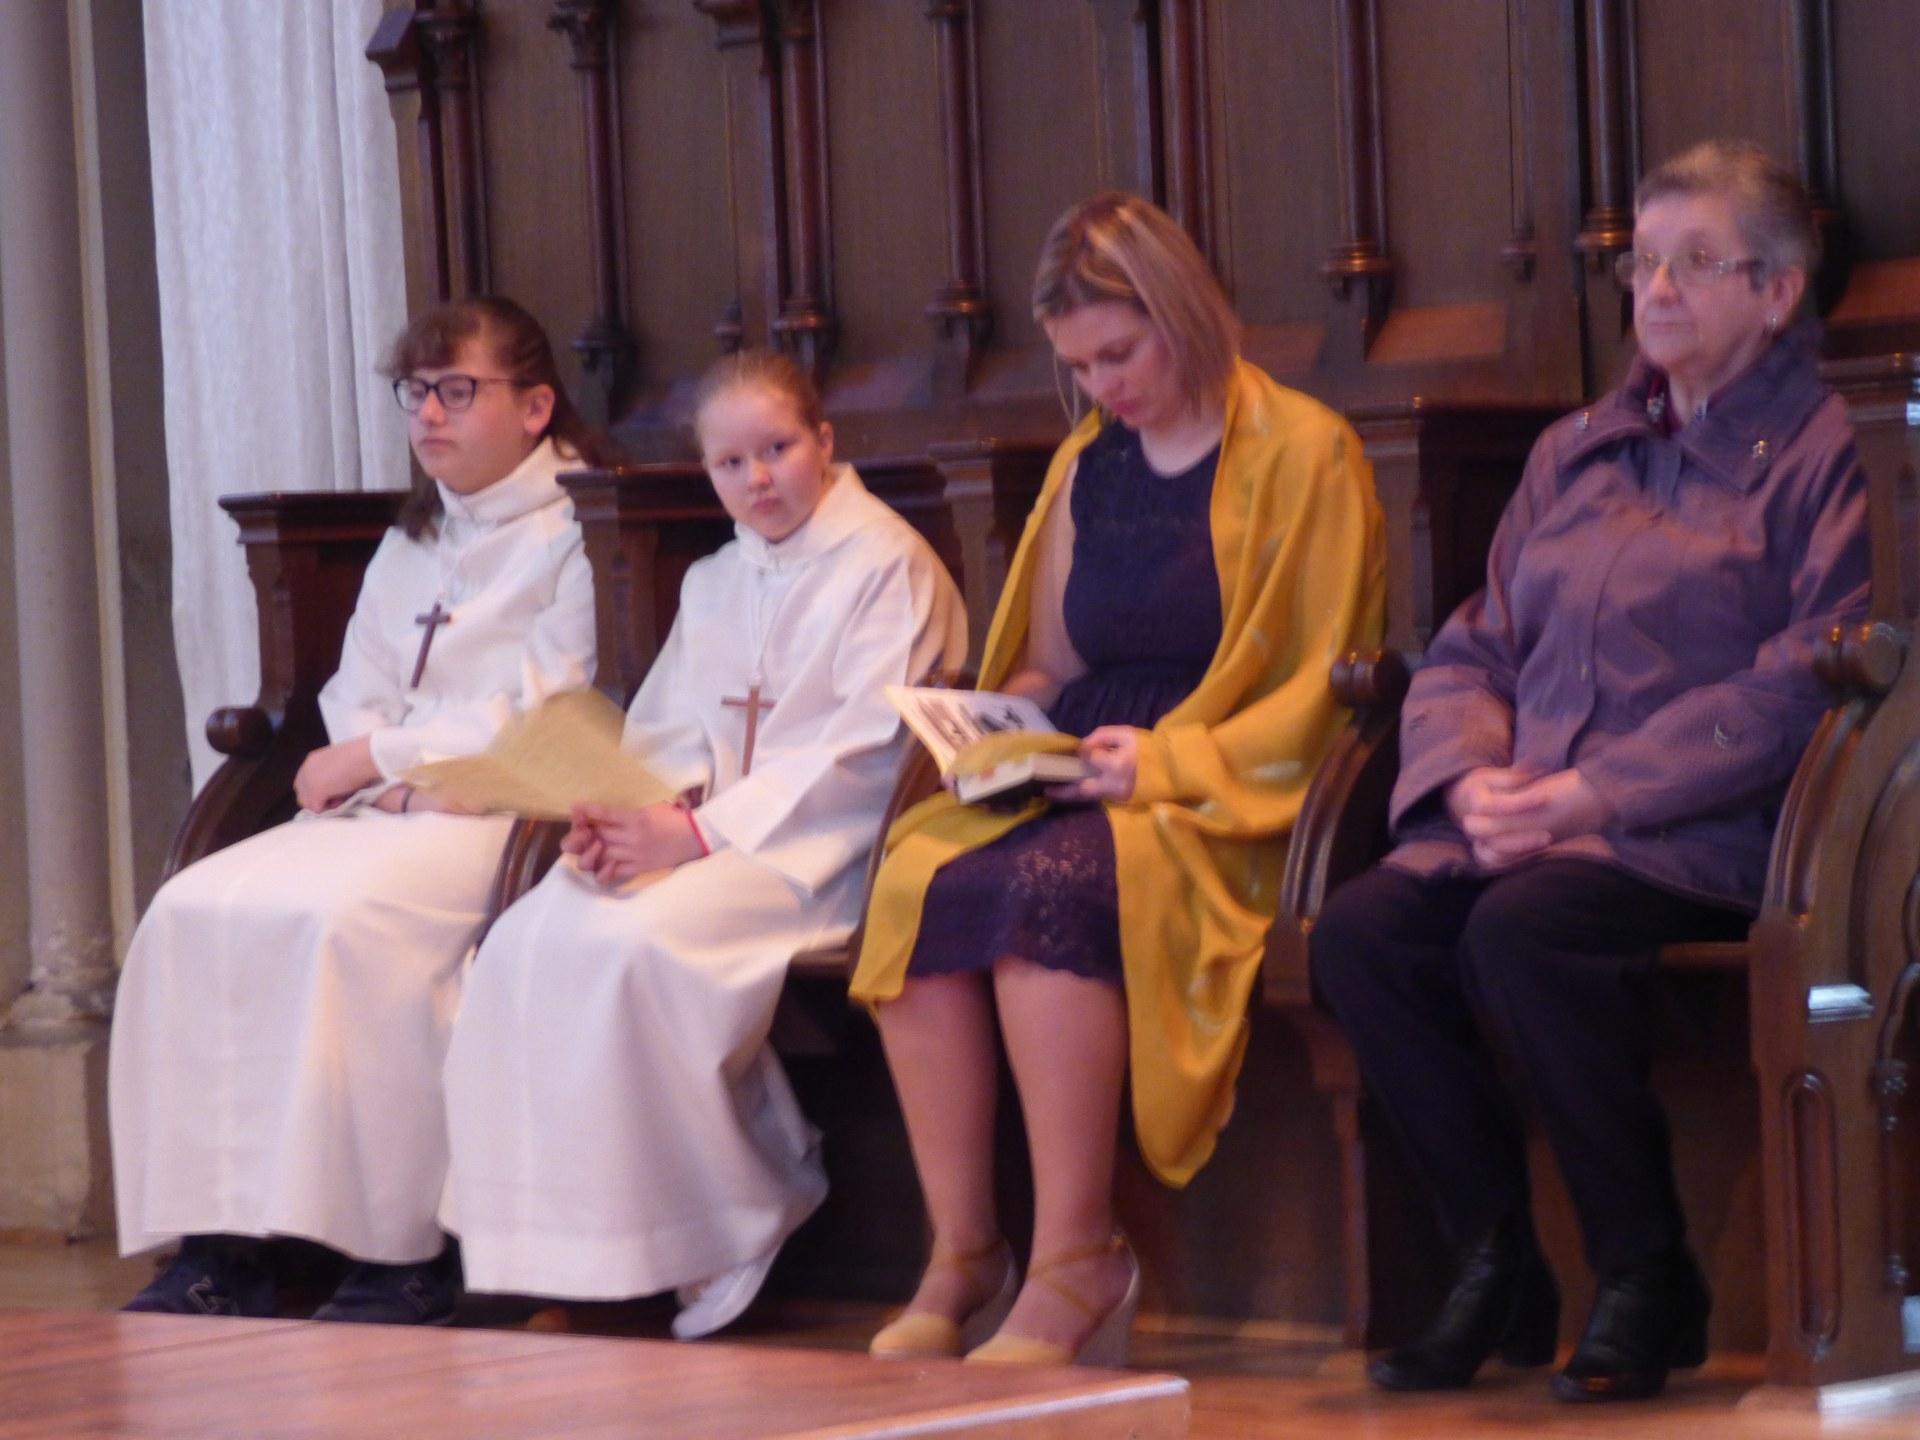 1eres communions Neuville 2018 (19)